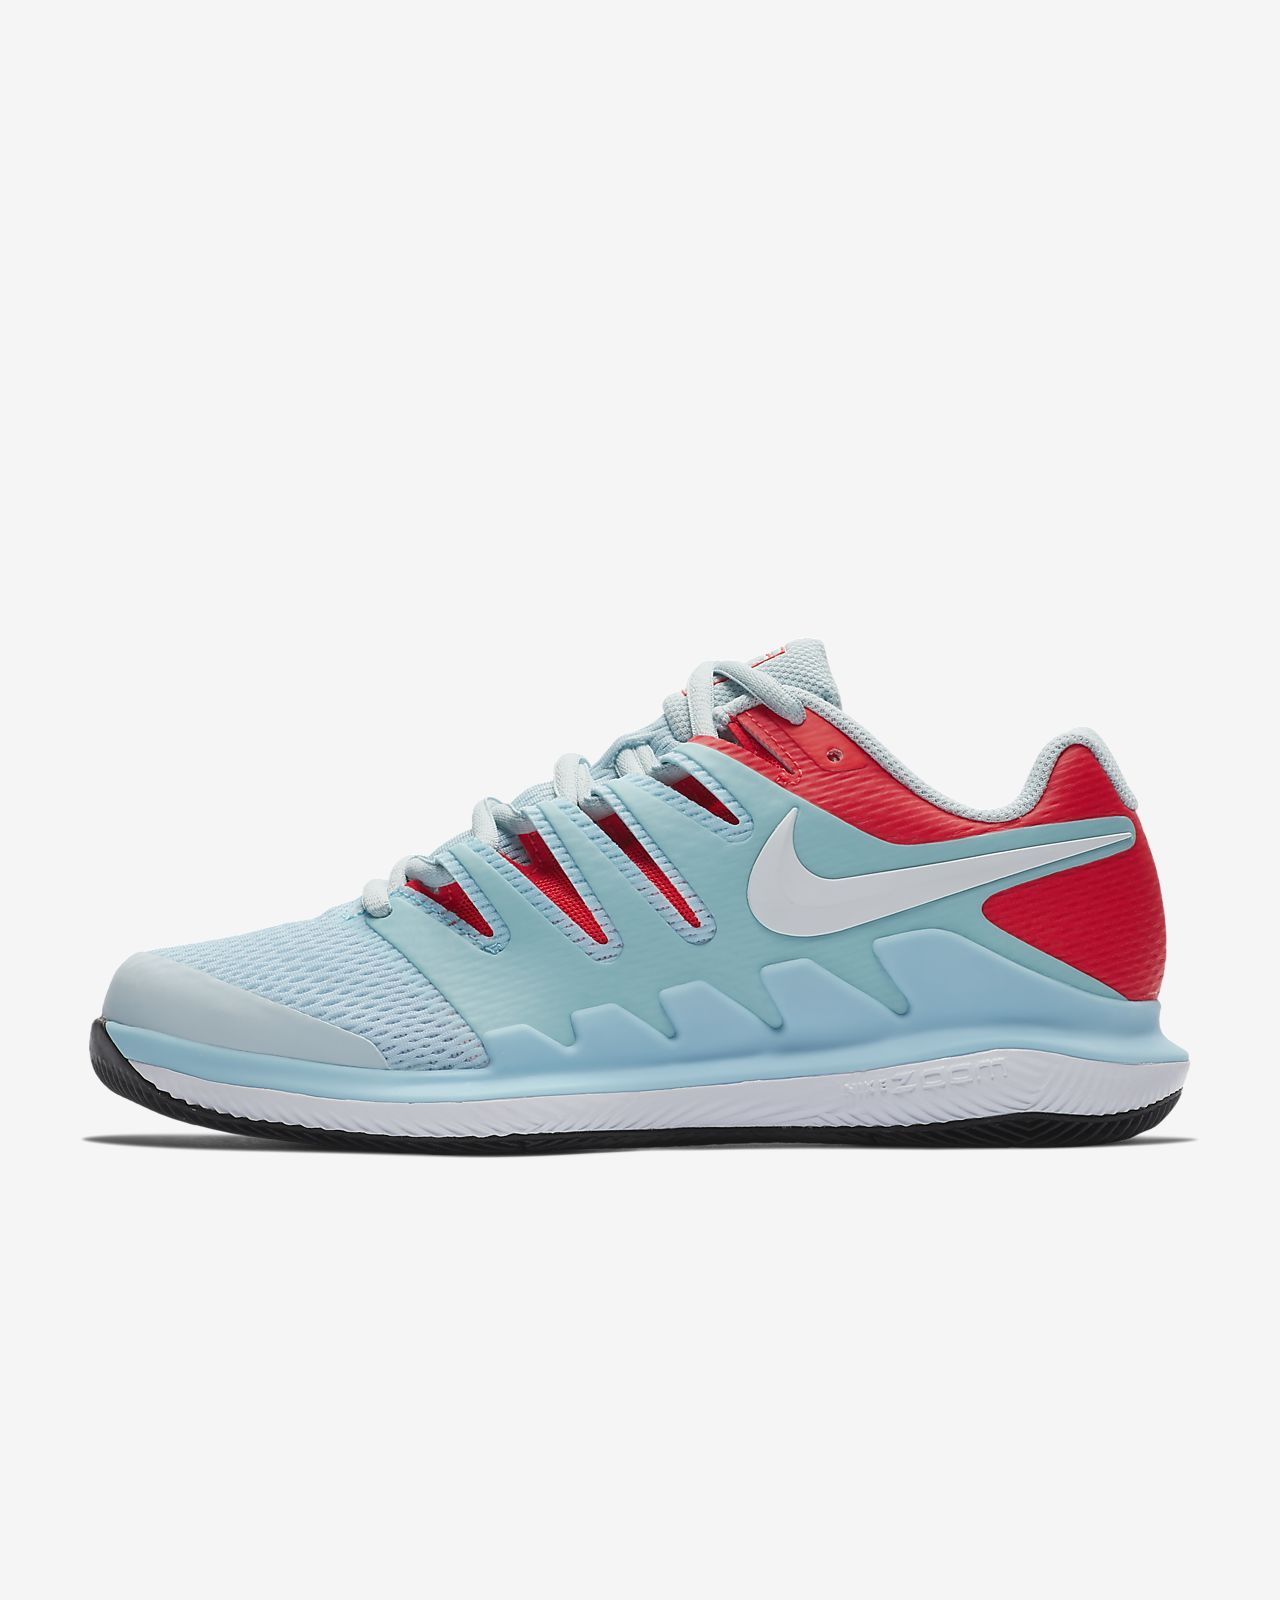 7781acfcc93dc ... Calzado de tenis para cancha dura para mujer NikeCourt Air Zoom Vapor X